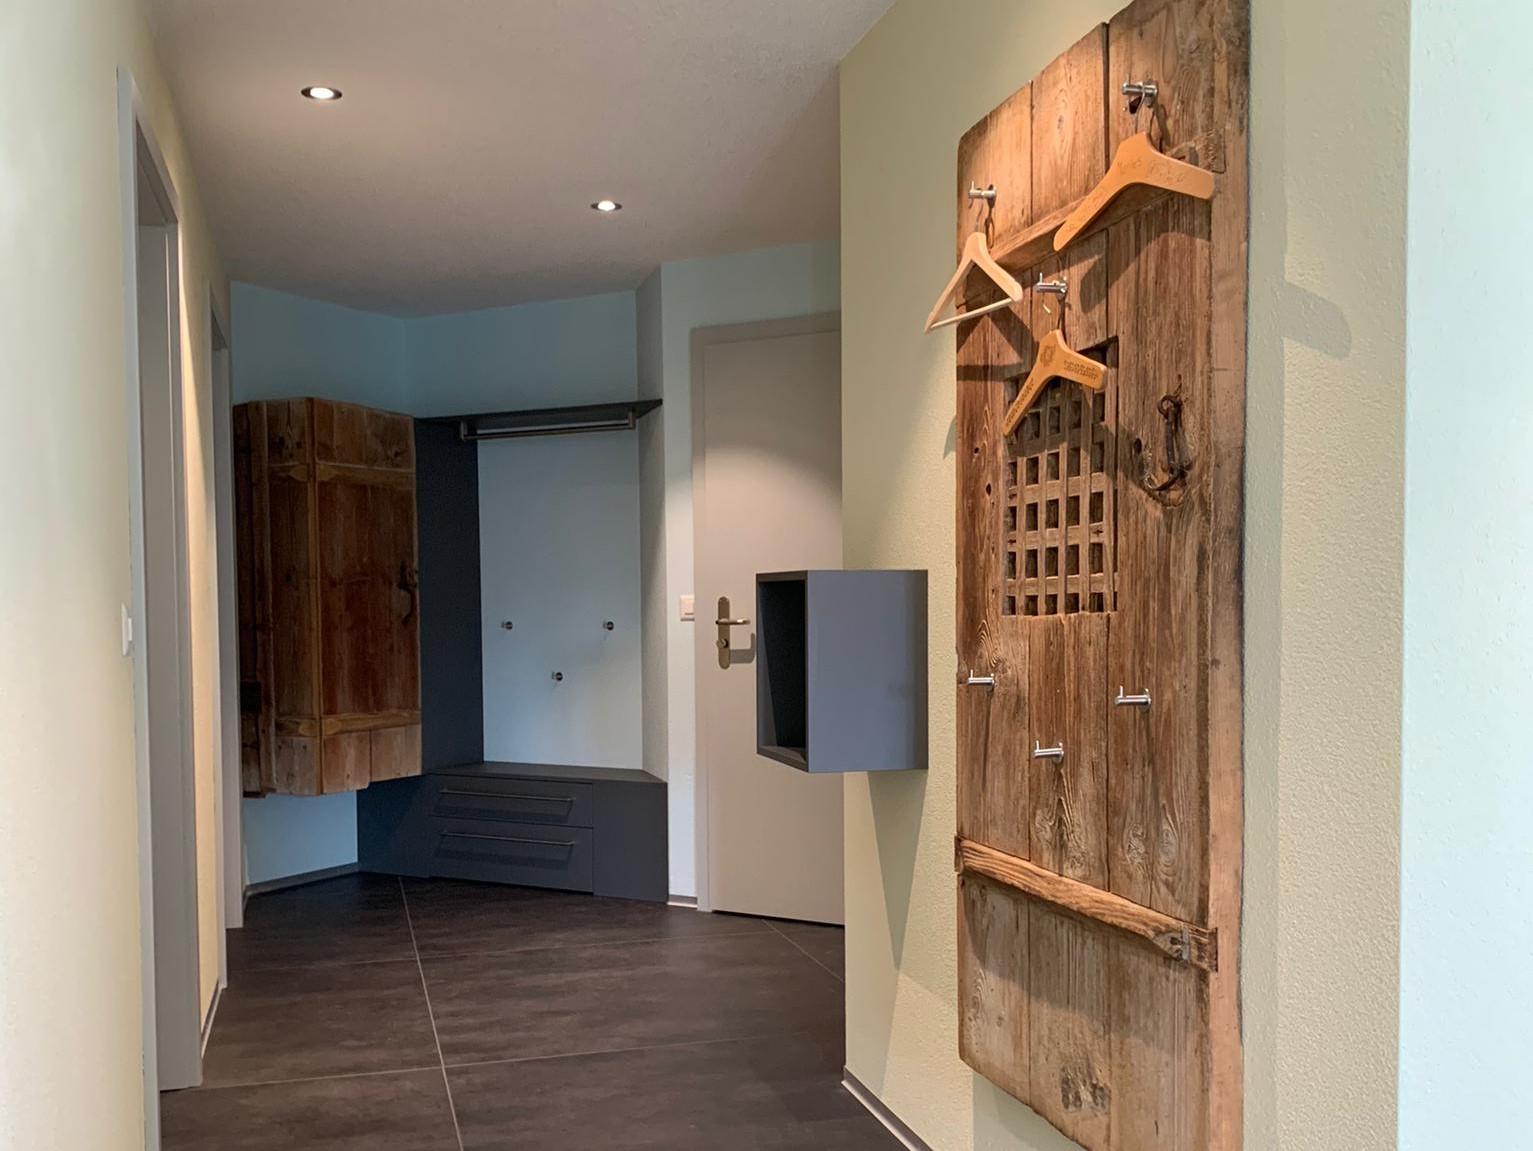 Woodddesign_Holzdesign_Altholz_Garderobe_modern_rustikal_gebürstet_Gästegarderobe (1)-min